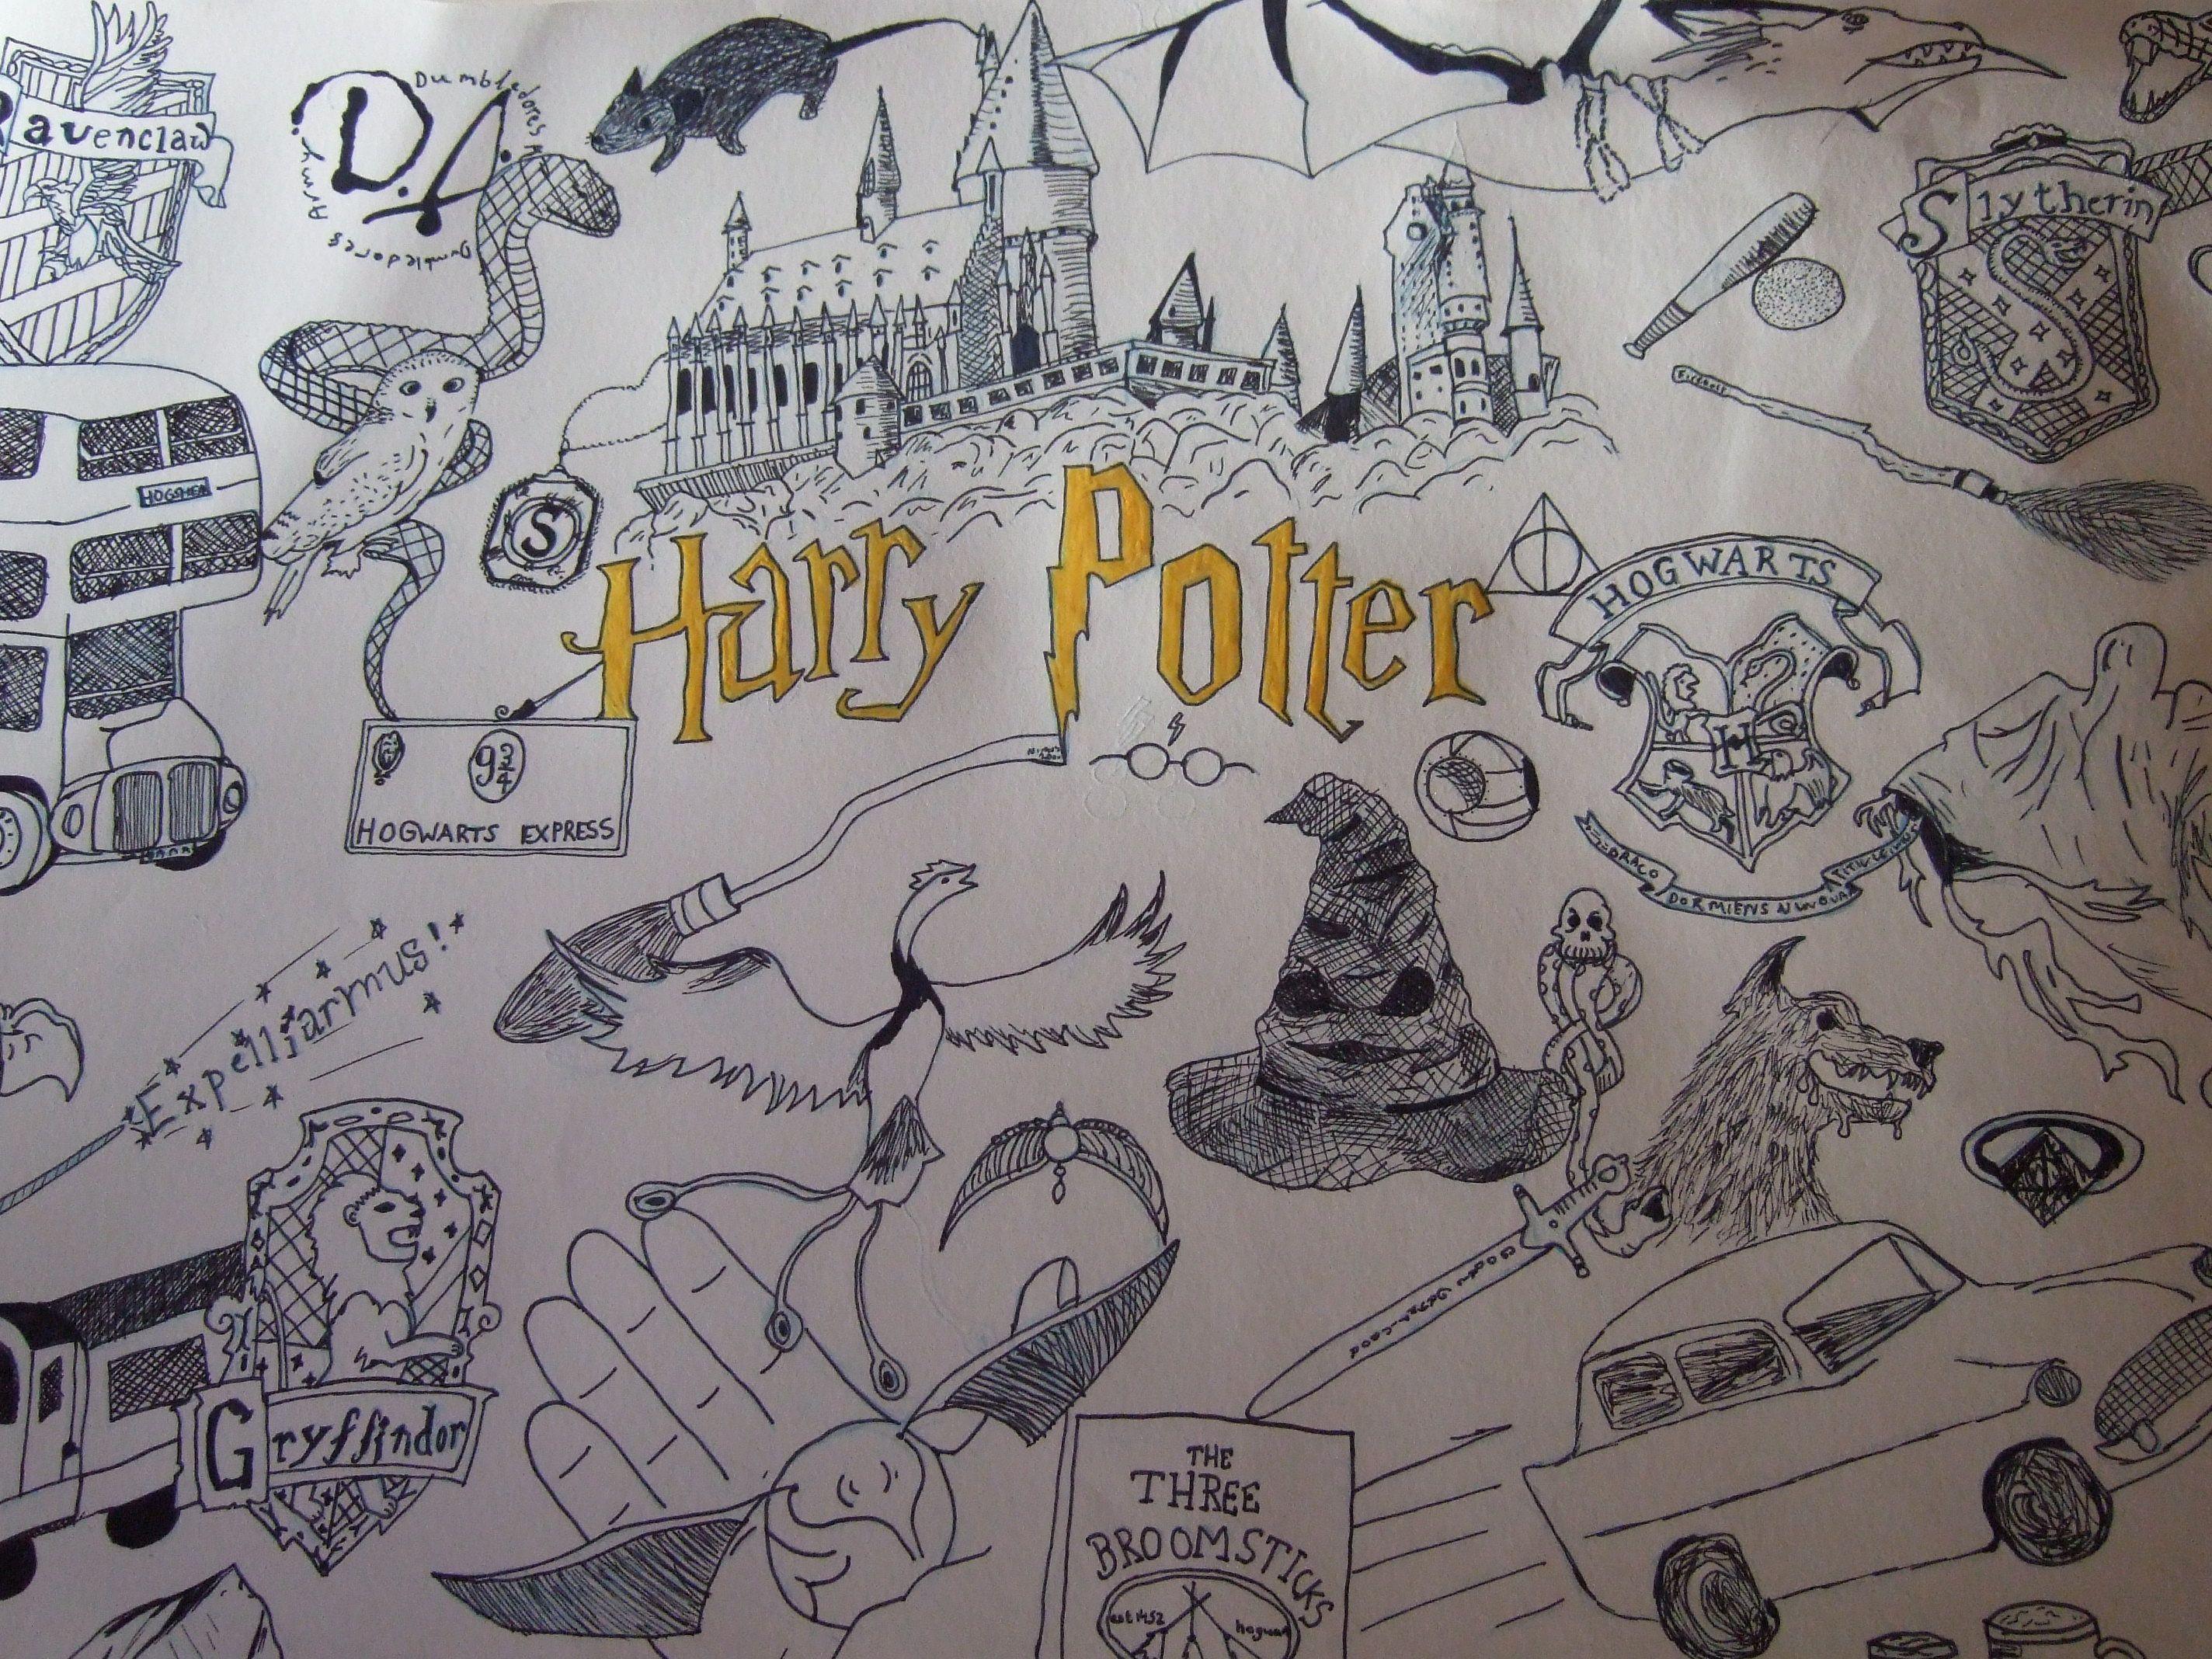 Ausmalbilder Harry Potter Genial Harry Potter Drawing I Did This It took Me Ages Neu Ausmalbilder Fotos